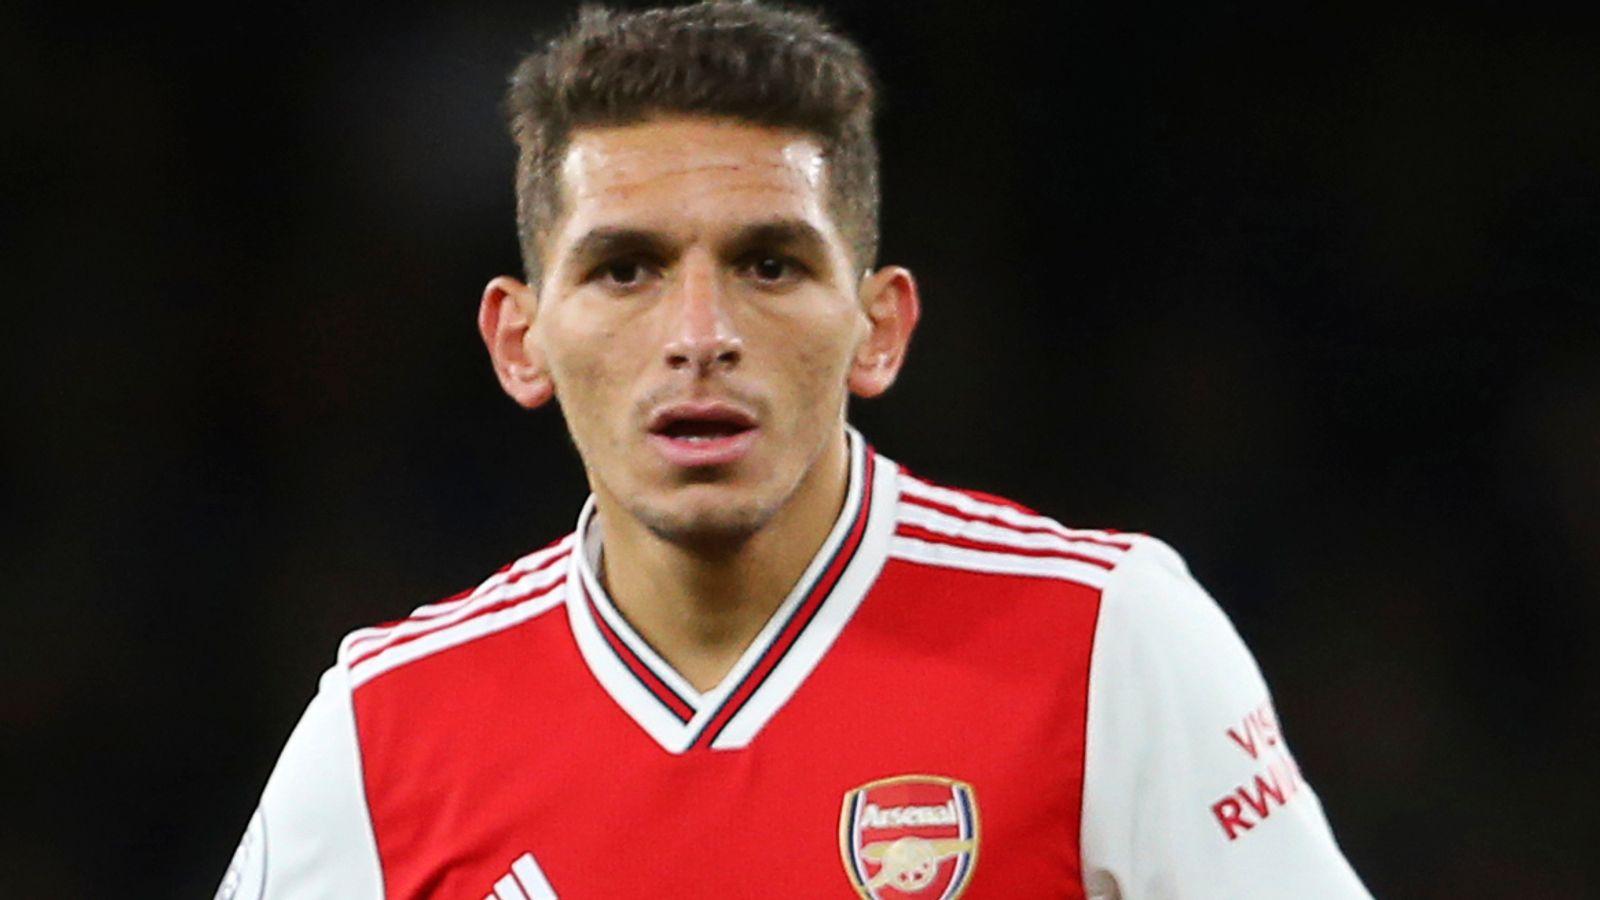 Lucas Torreira joins Fiorentina on season-long loan